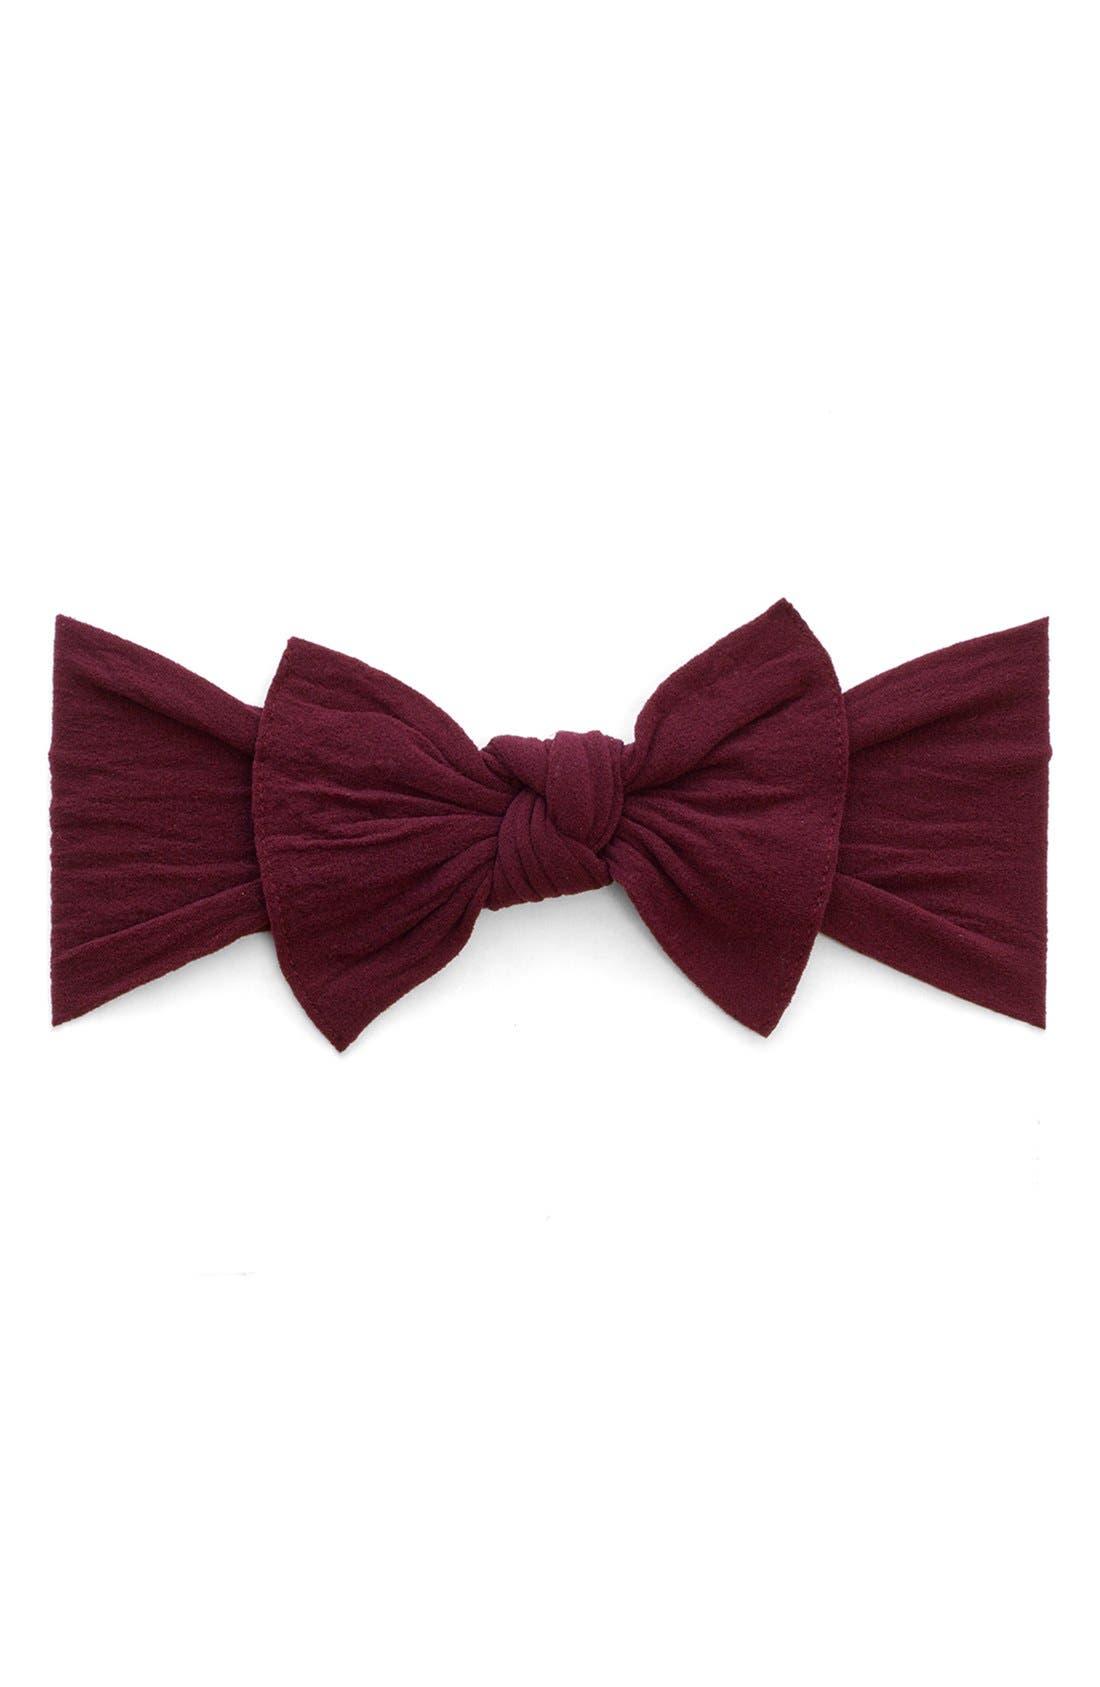 653e41aa8f4fd hair bows | Nordstrom